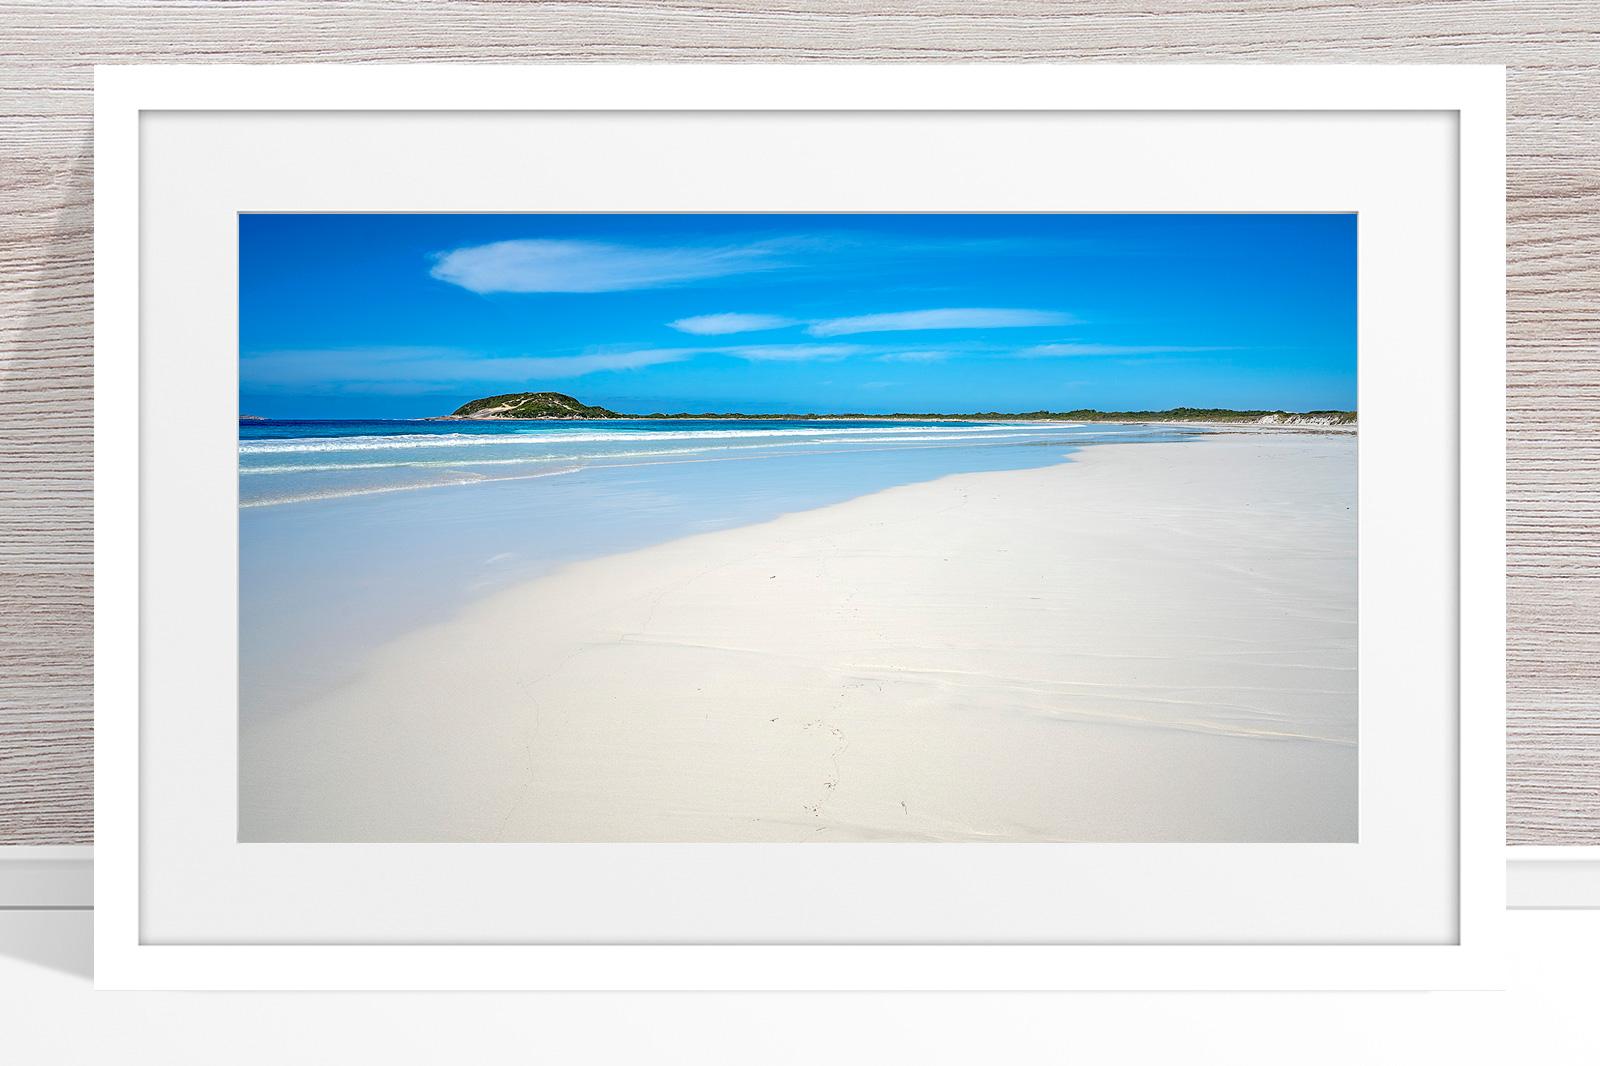 009 - Jason Mazur - 'Cape Le Grand Beachscape' White Frame